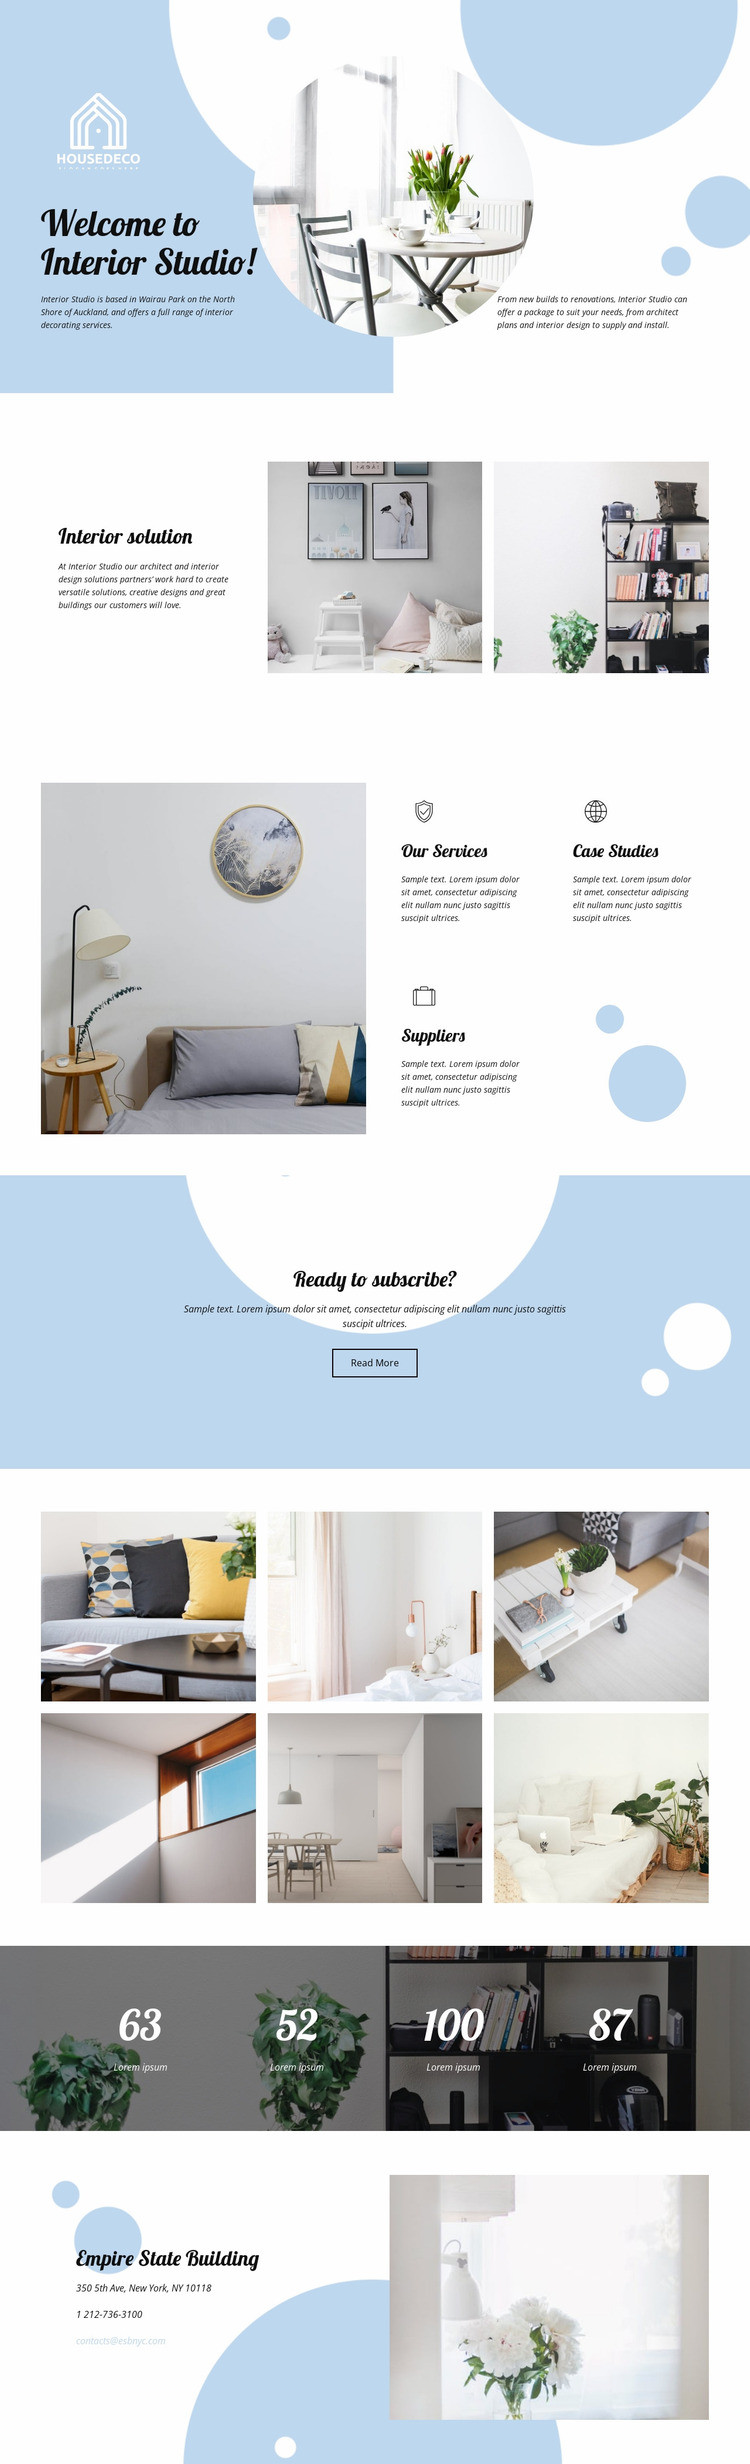 Interior Studio Website Mockup